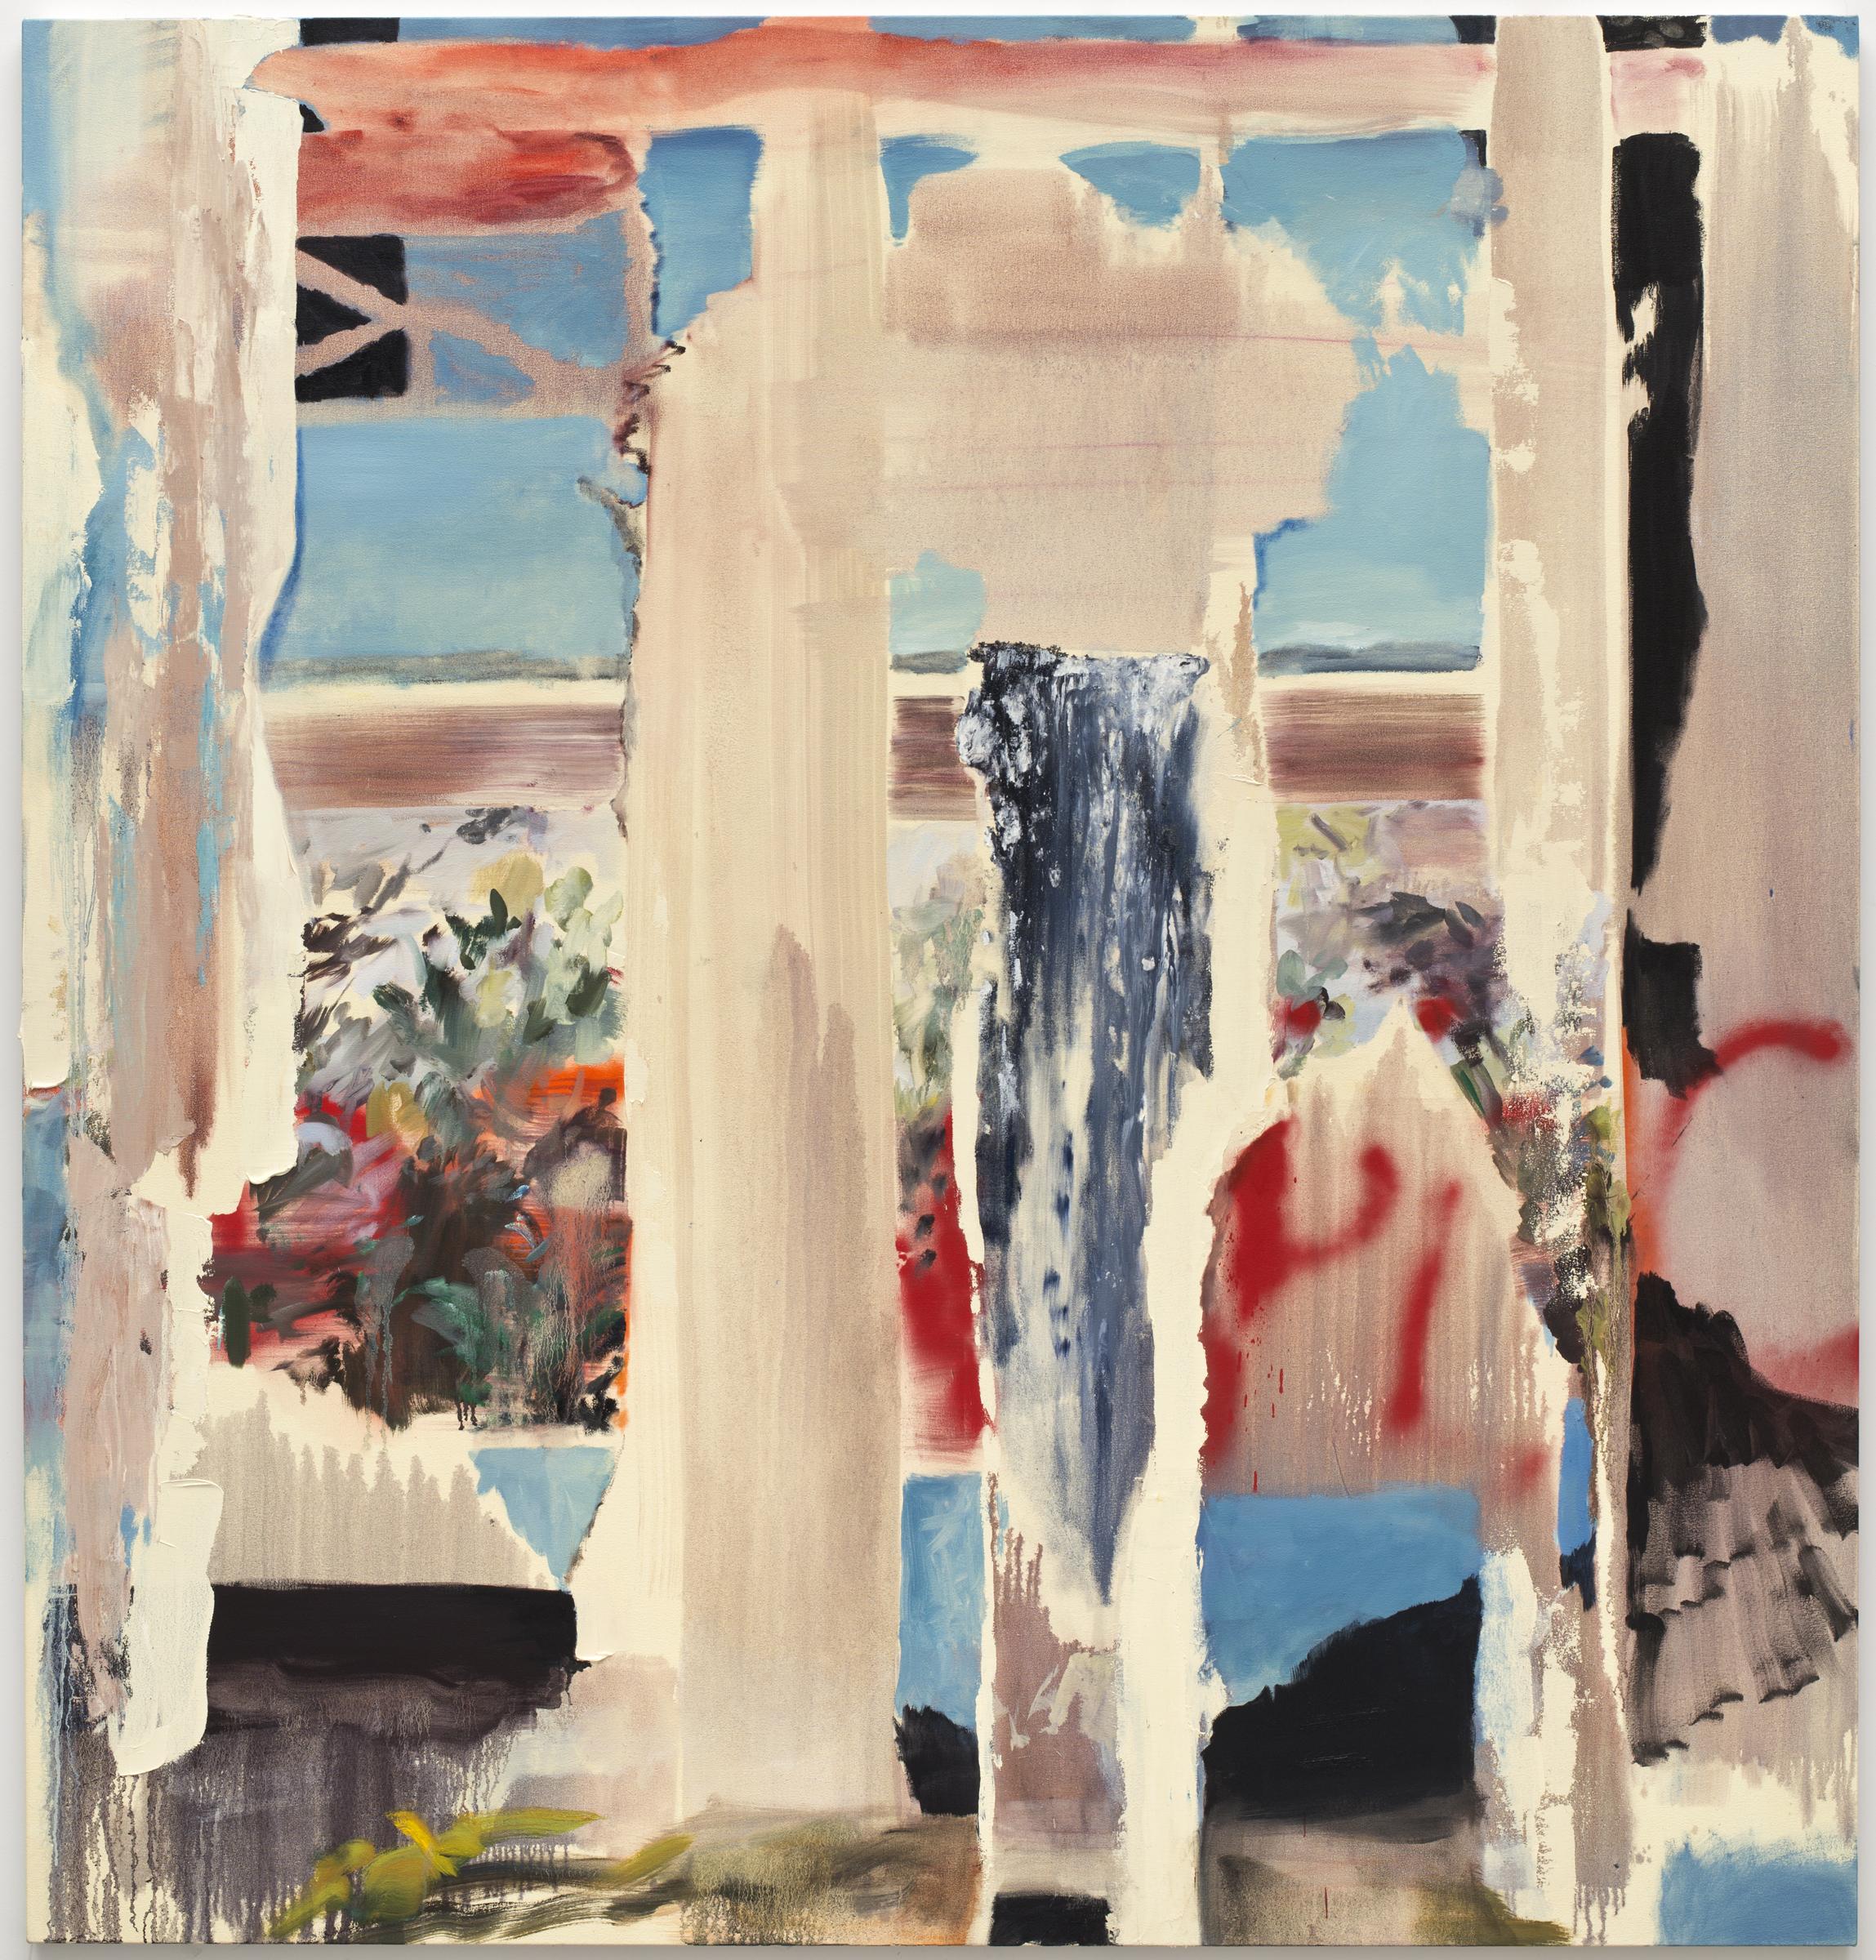 Various Peep Shows (Through) , Oil, acrylic, enamel spraypaint on canvas, 84 x 82 inches 2013